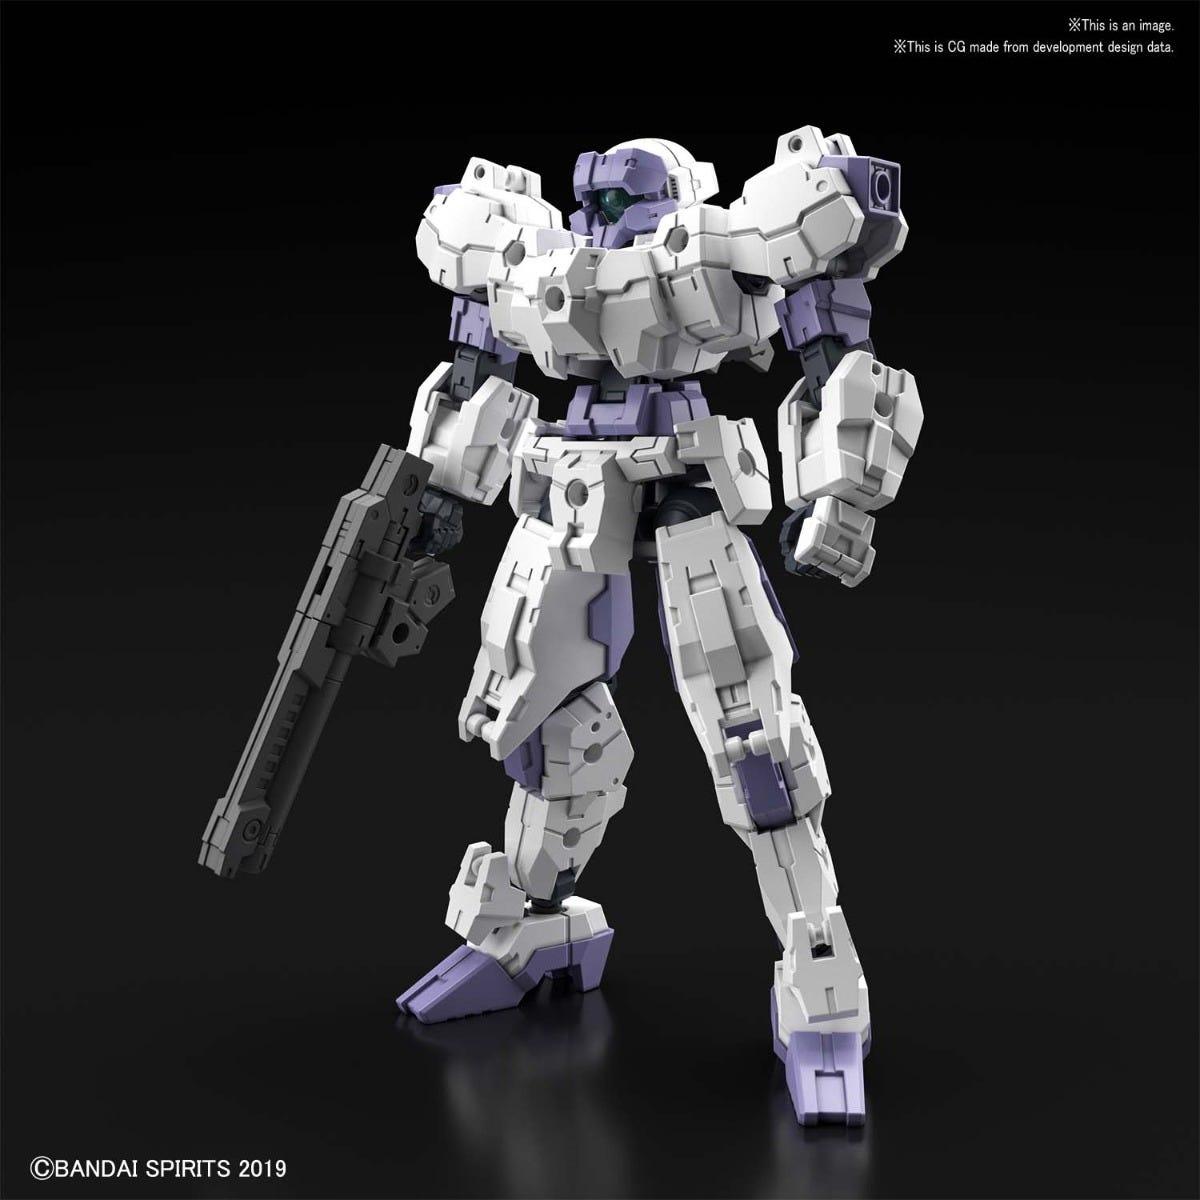 Bandai Spirits 30 Minute Missions #23 1/144 eEXM-21 Rabiot (White)